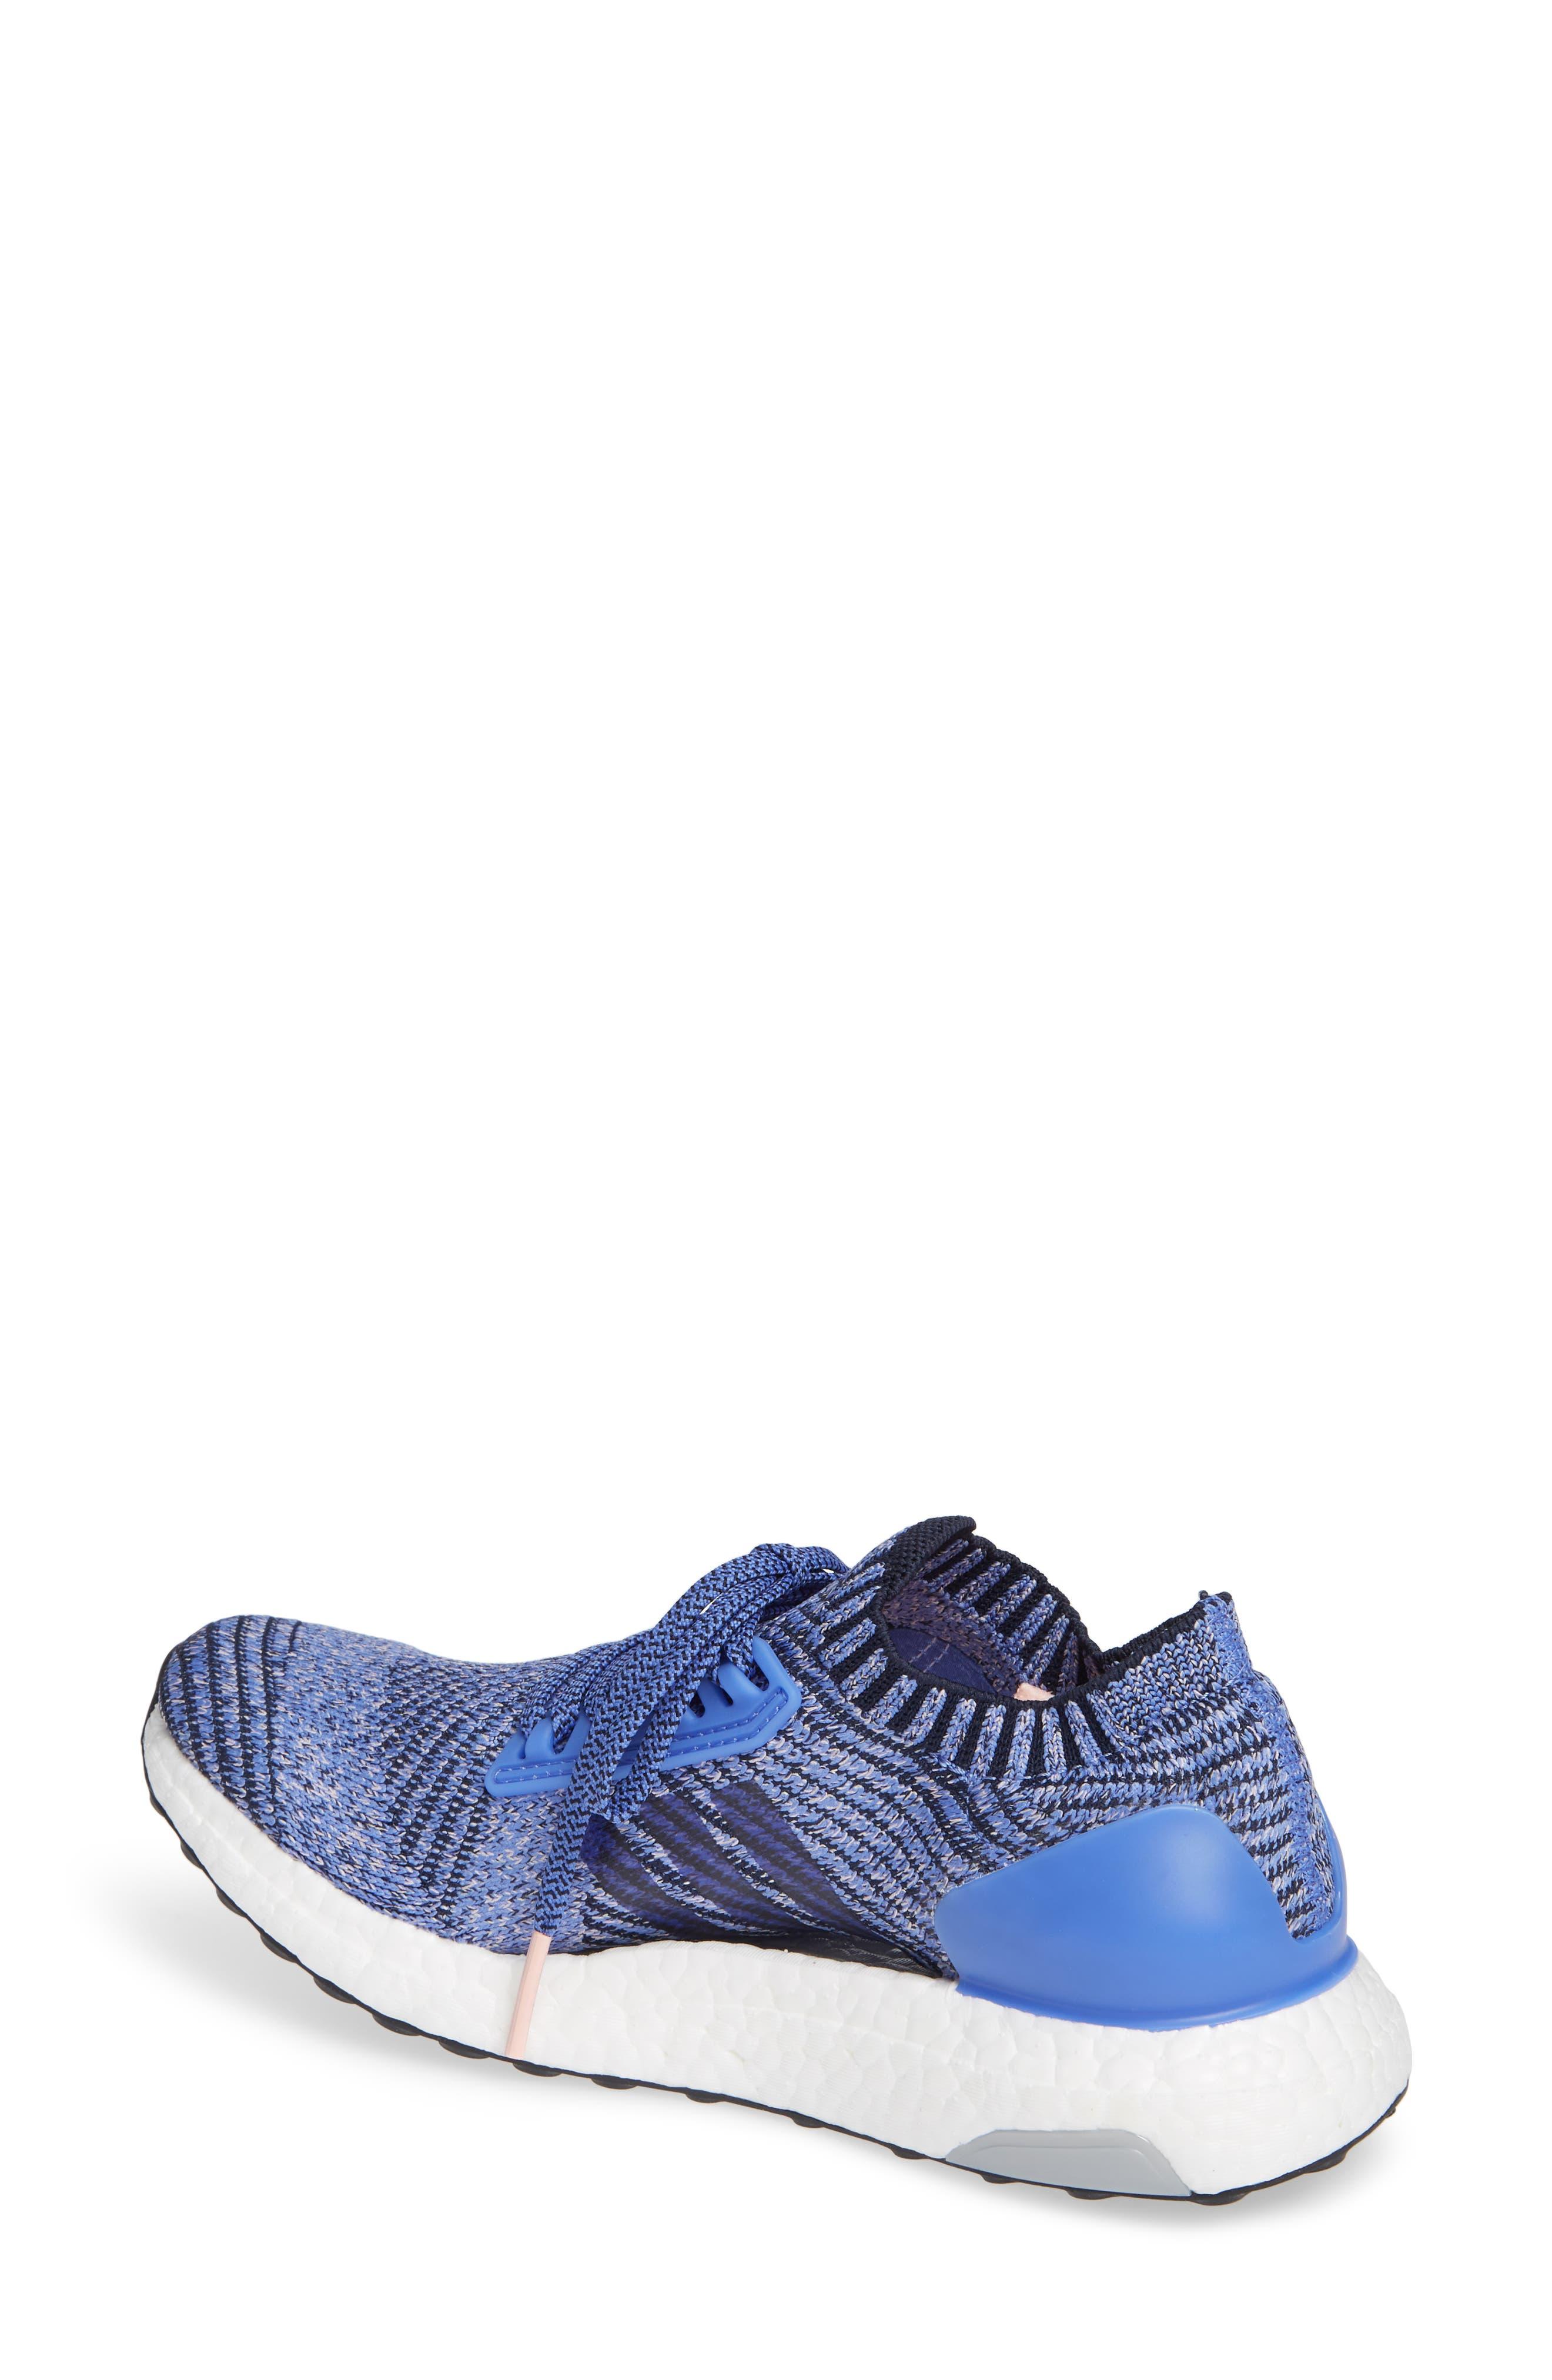 UltraBoost X Running Shoe,                             Alternate thumbnail 2, color,                             REAL LILAC/ LEGEND INK/ BLACK